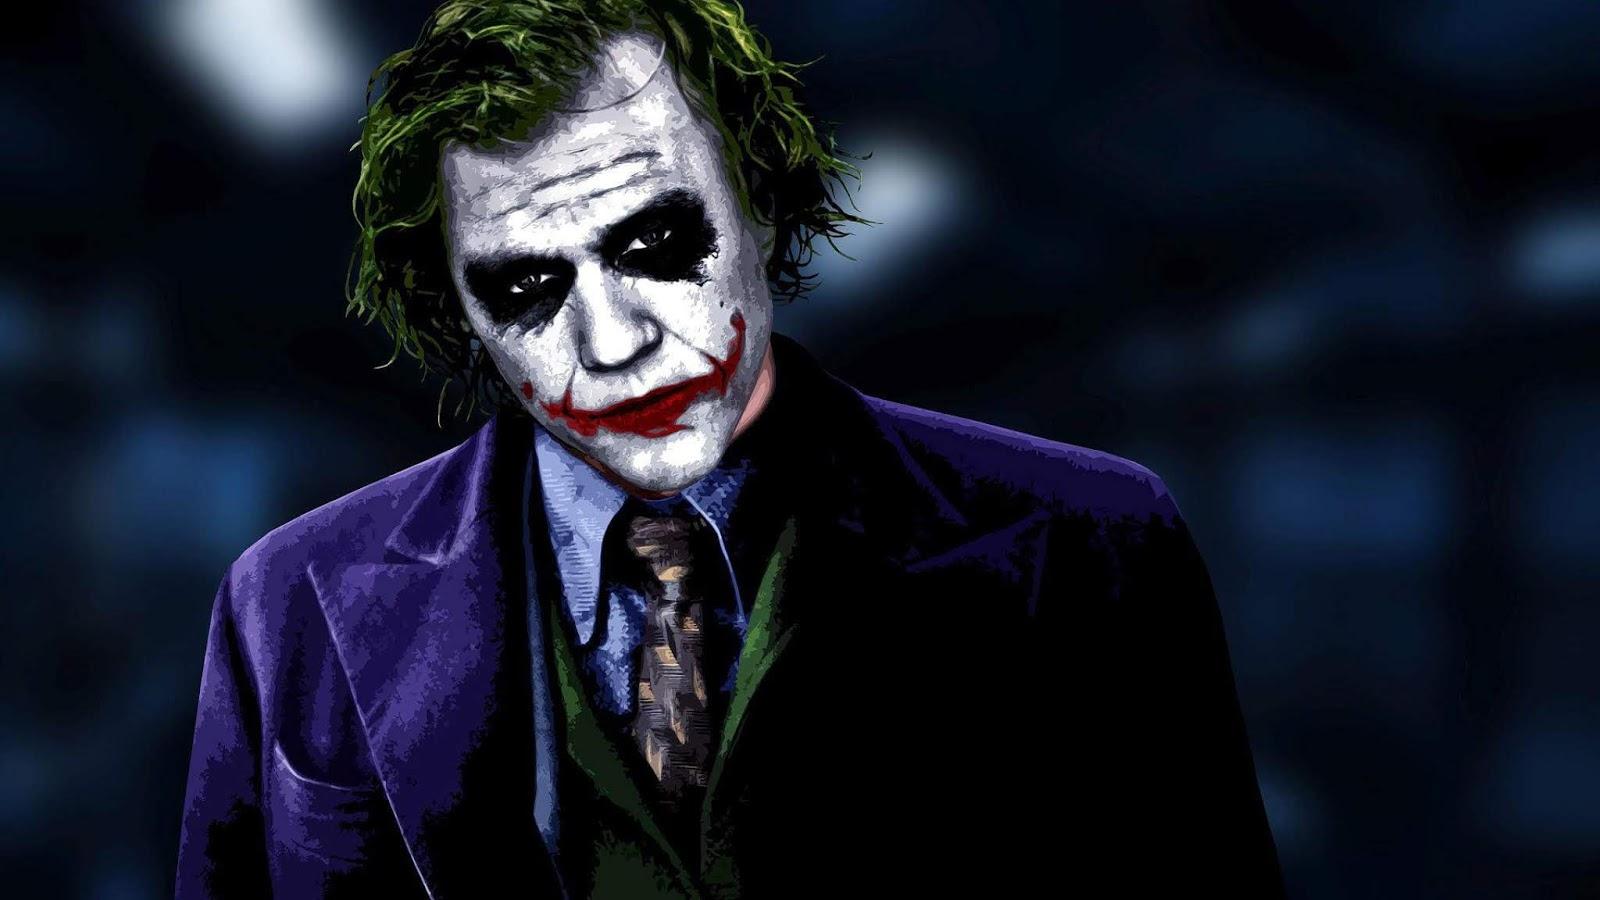 heath-ledger-joker-quotes